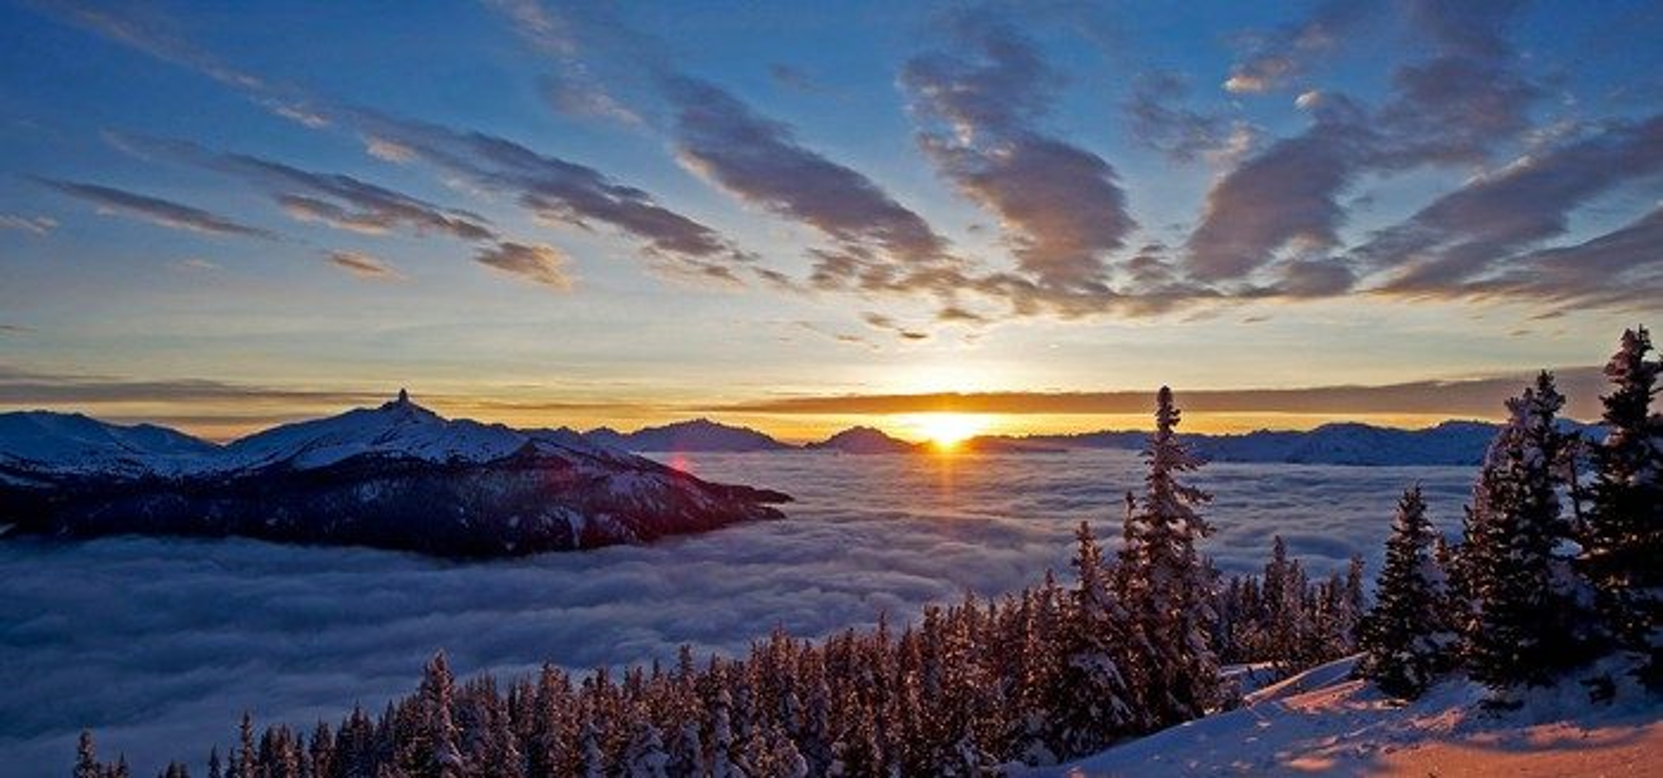 A sunrise over mountains.